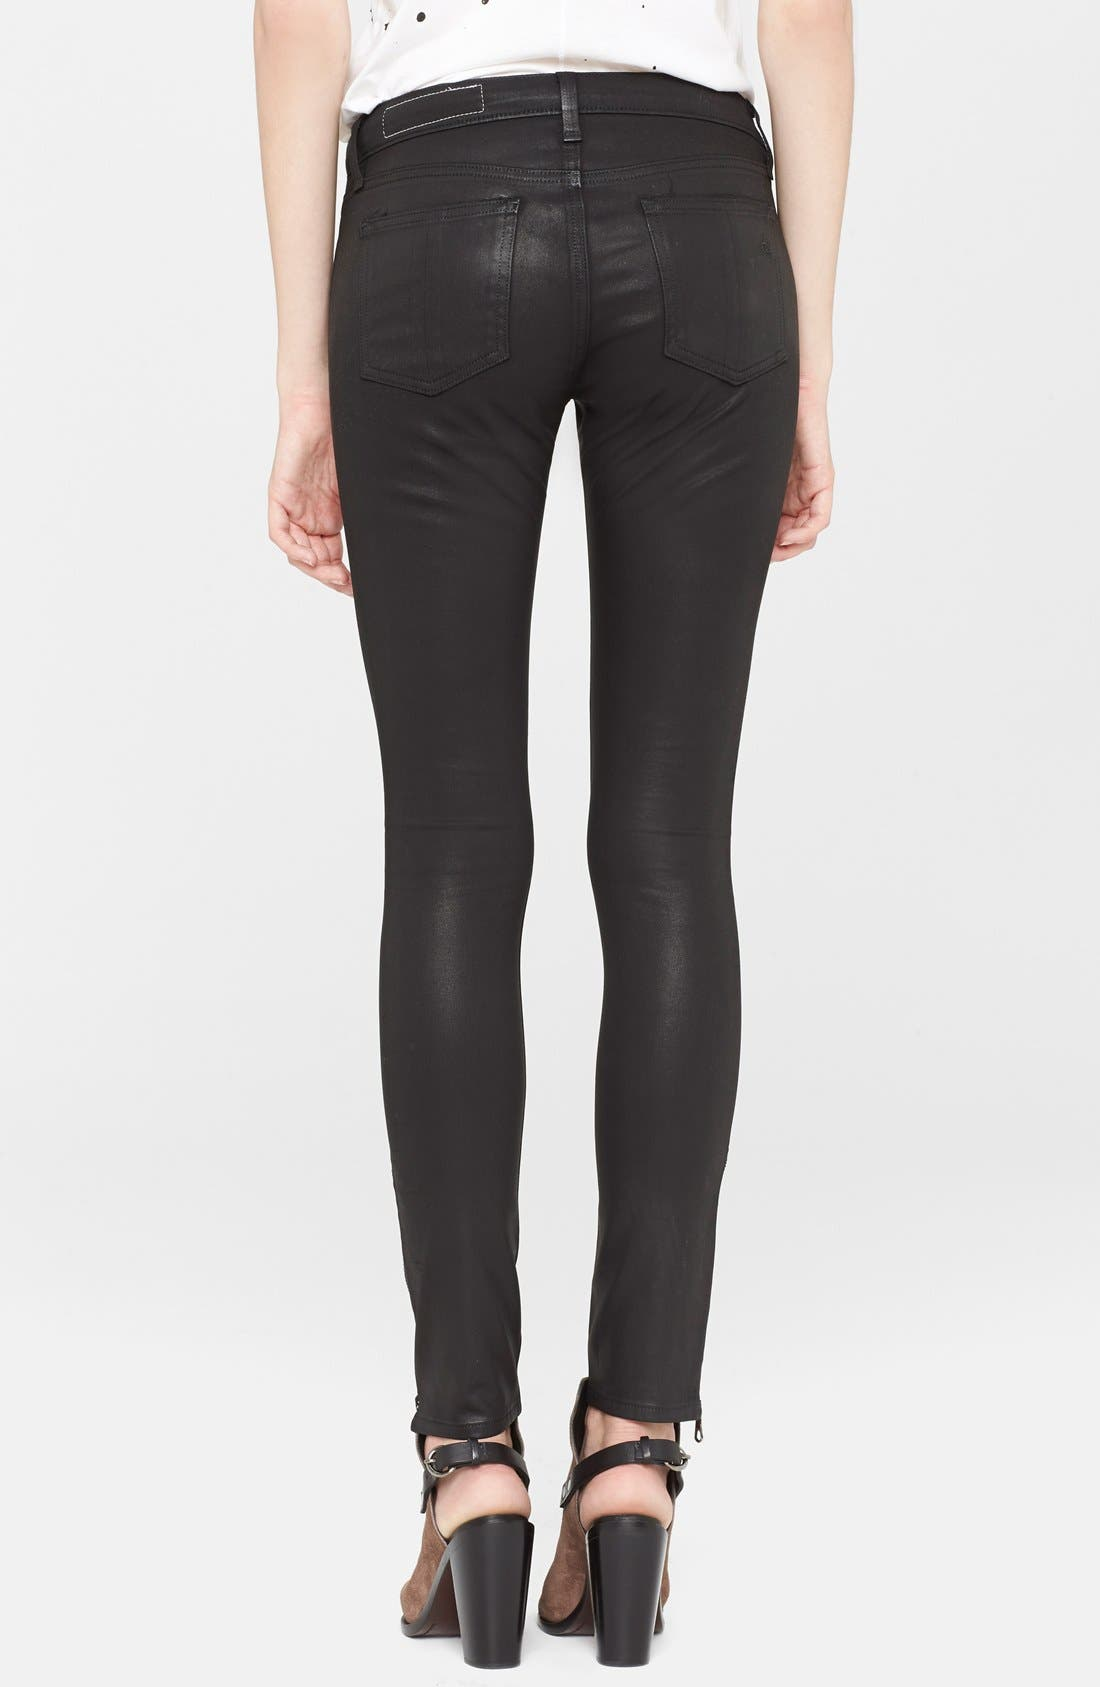 Alternate Image 2  - rag & bone/JEAN Coated Ankle Zip Skinny Jeans (Coated Black)